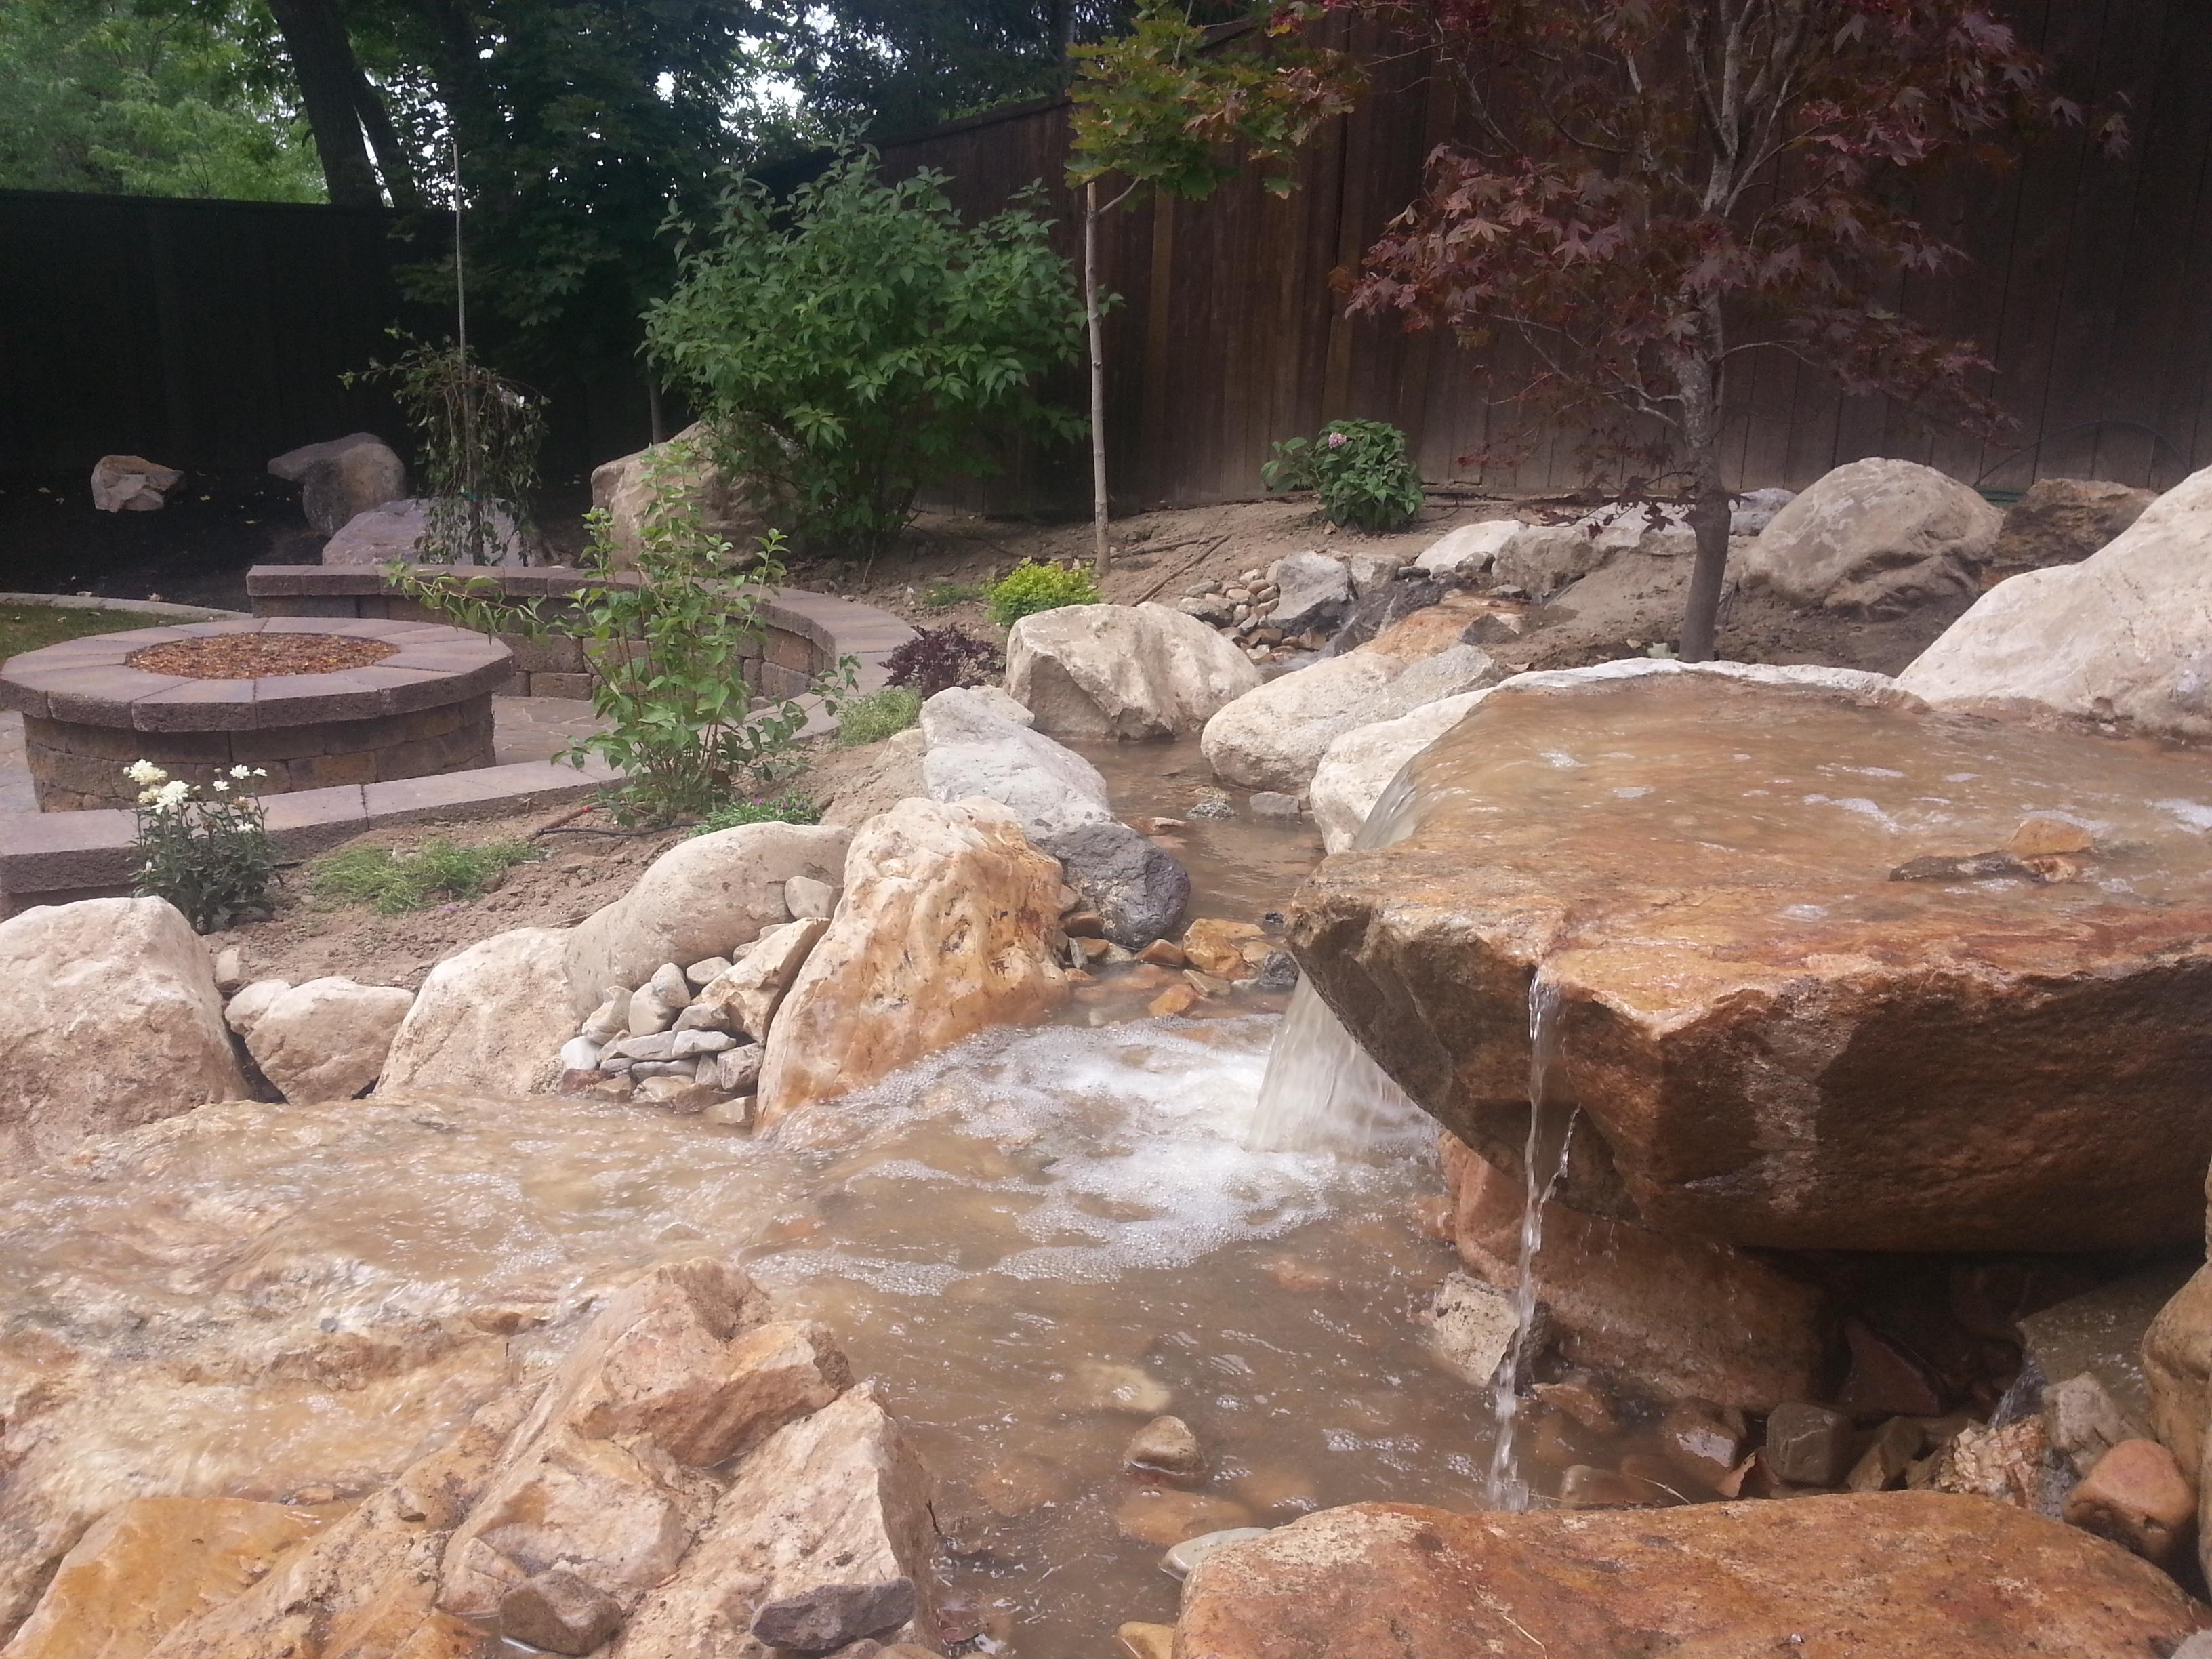 Rock walls chris jensen landscaping in salt lake city for Landscaping rocks utah county